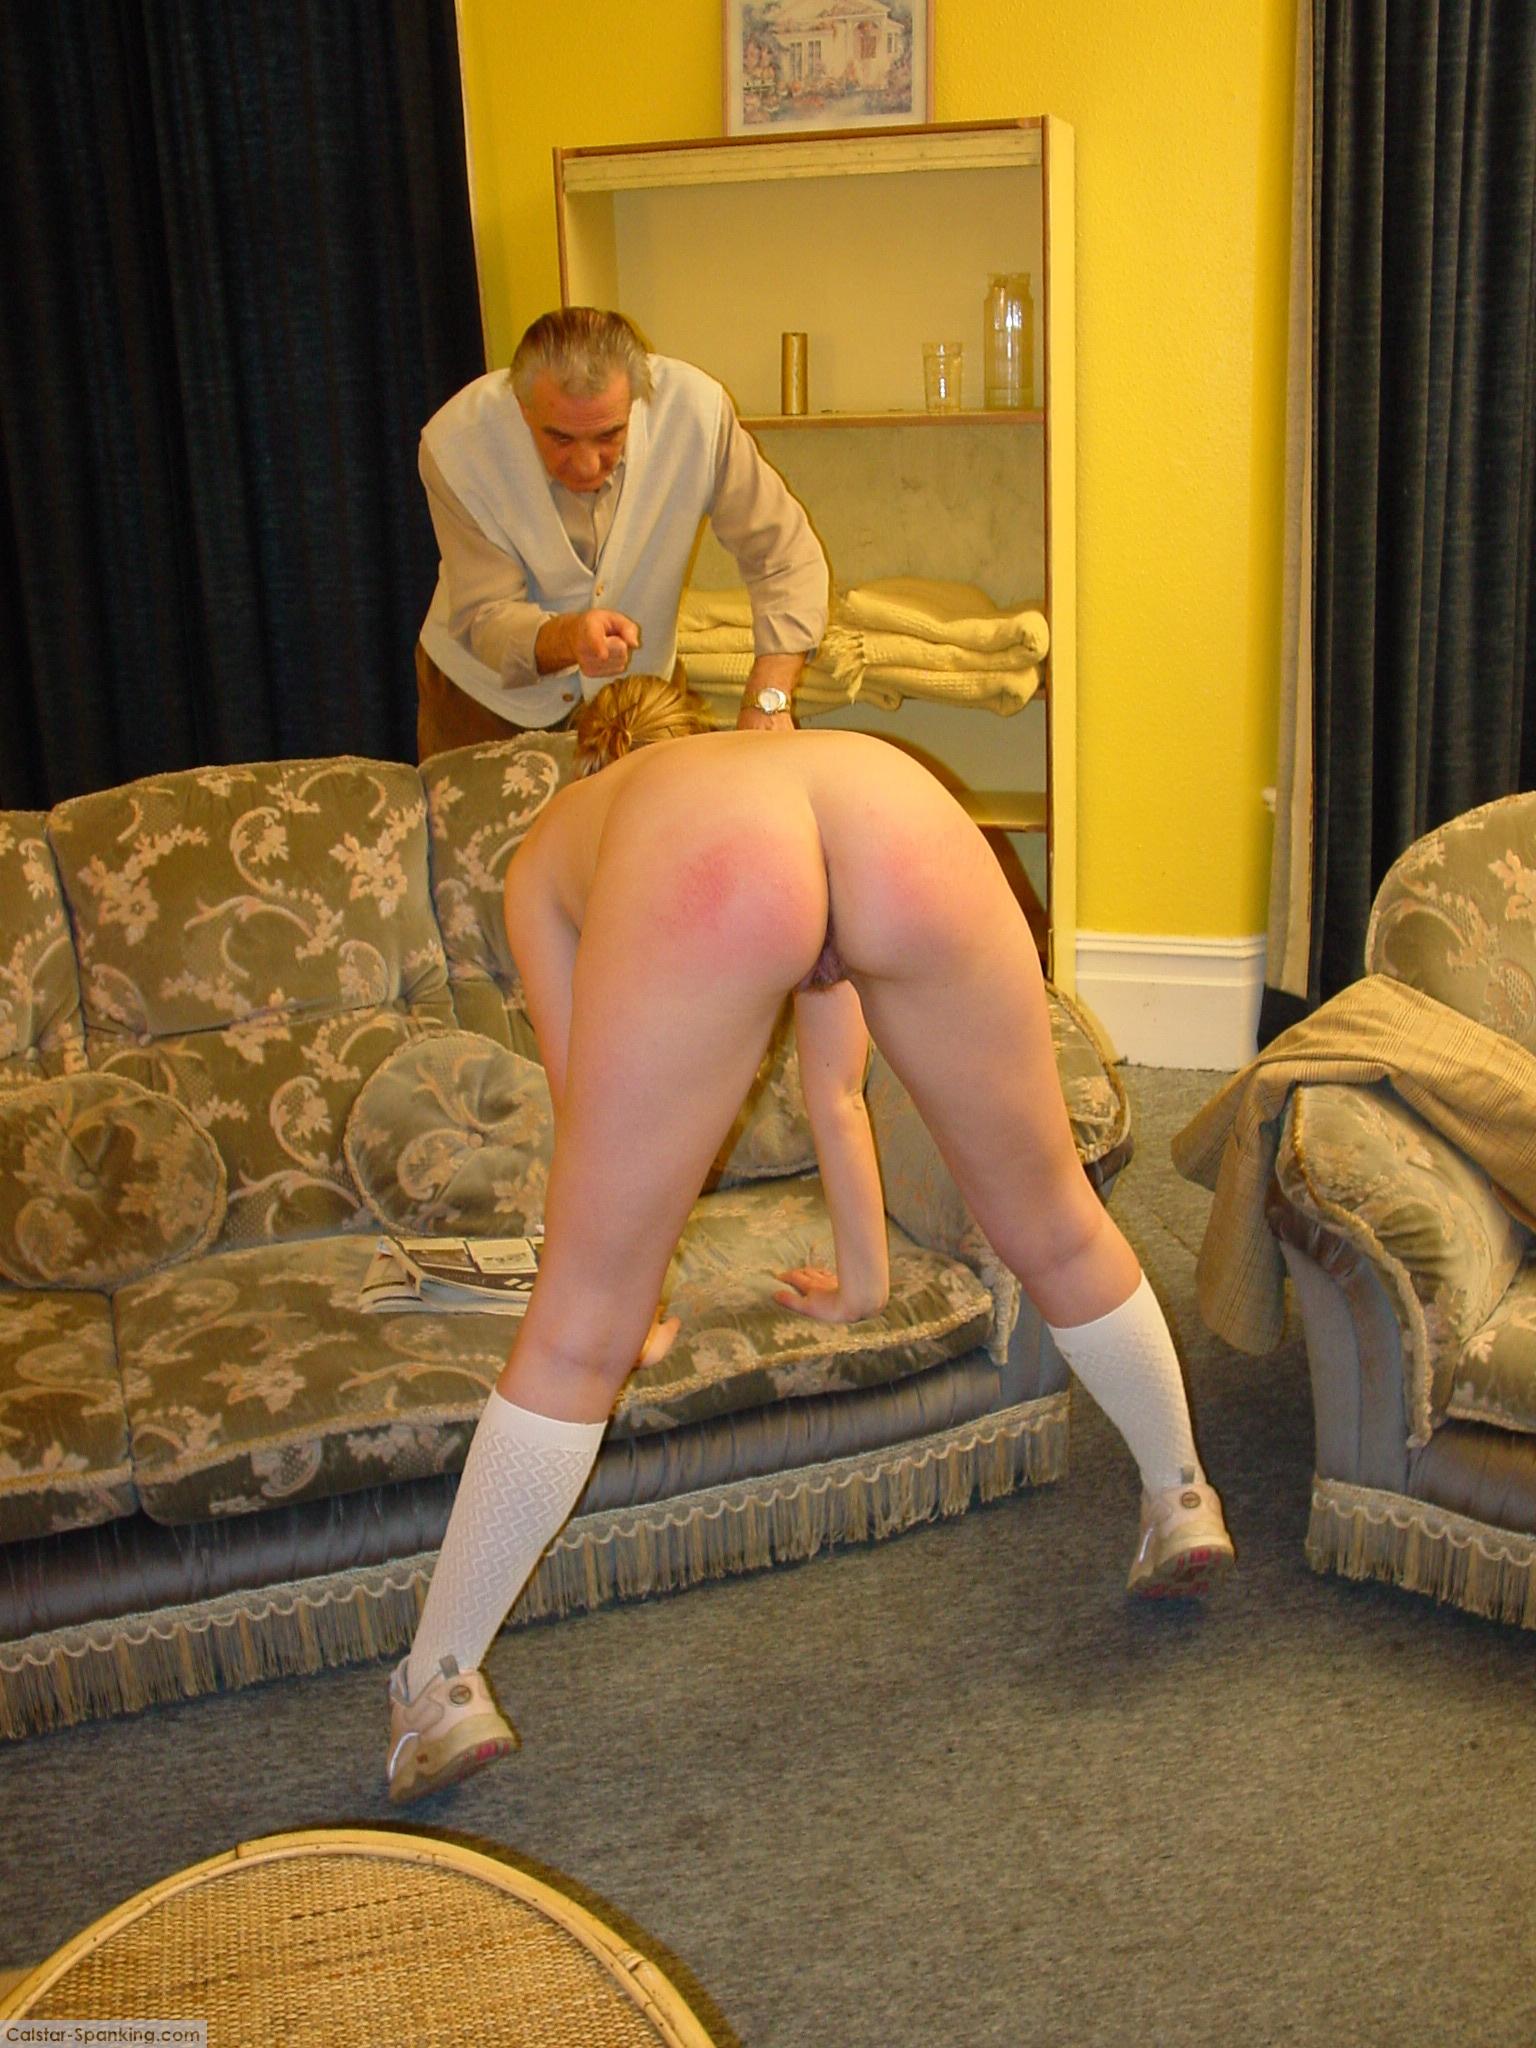 california star spanking